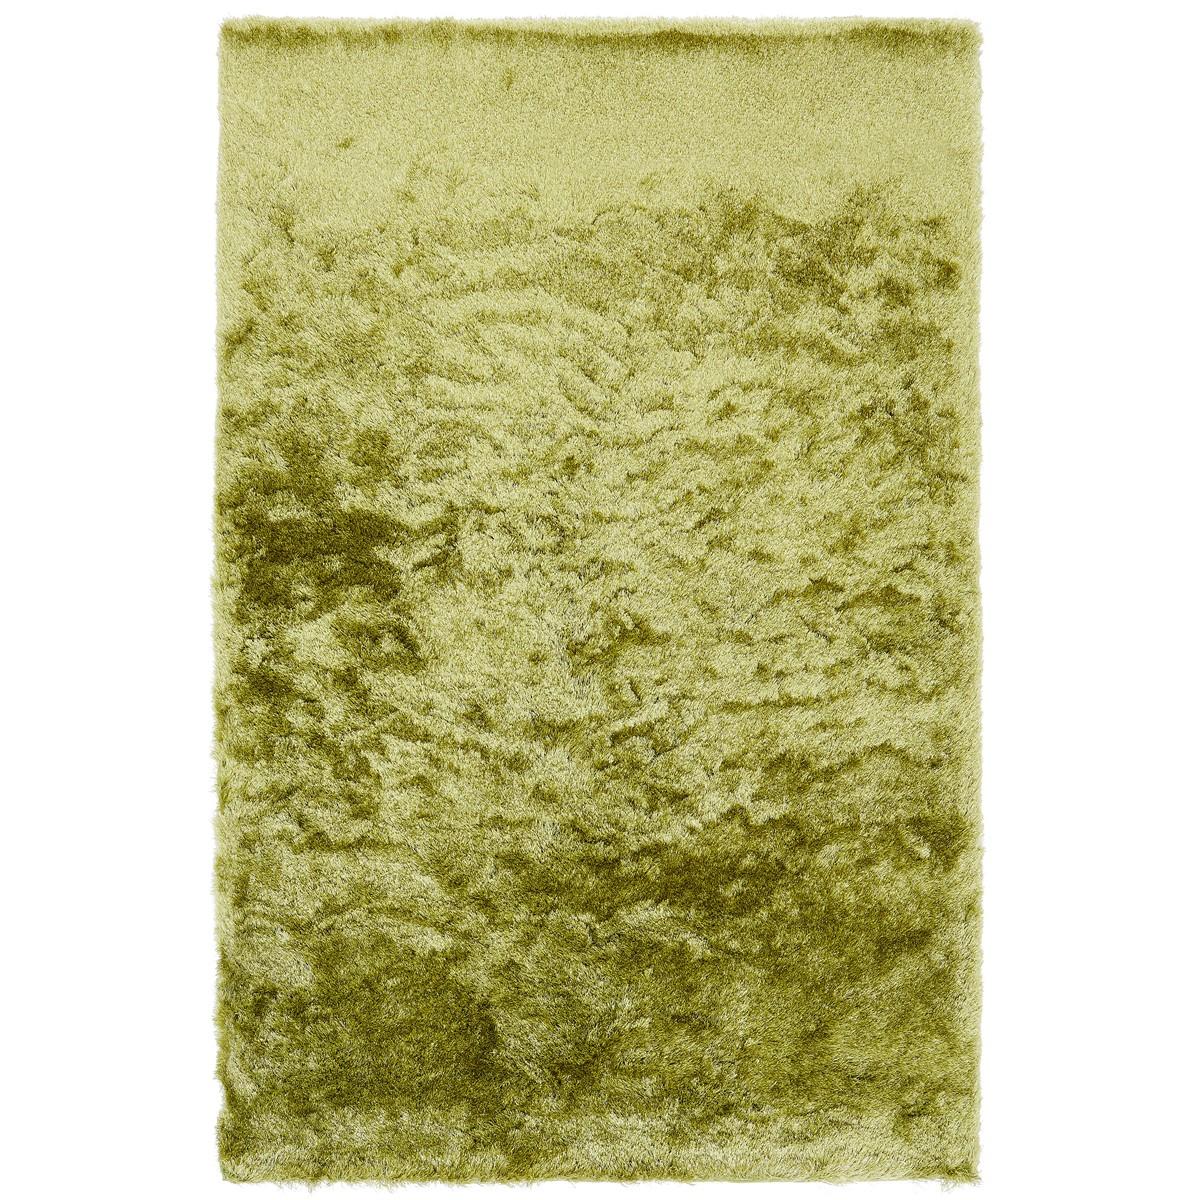 Tapis shaggy doux en Polyester Vert clair 140x200 cm